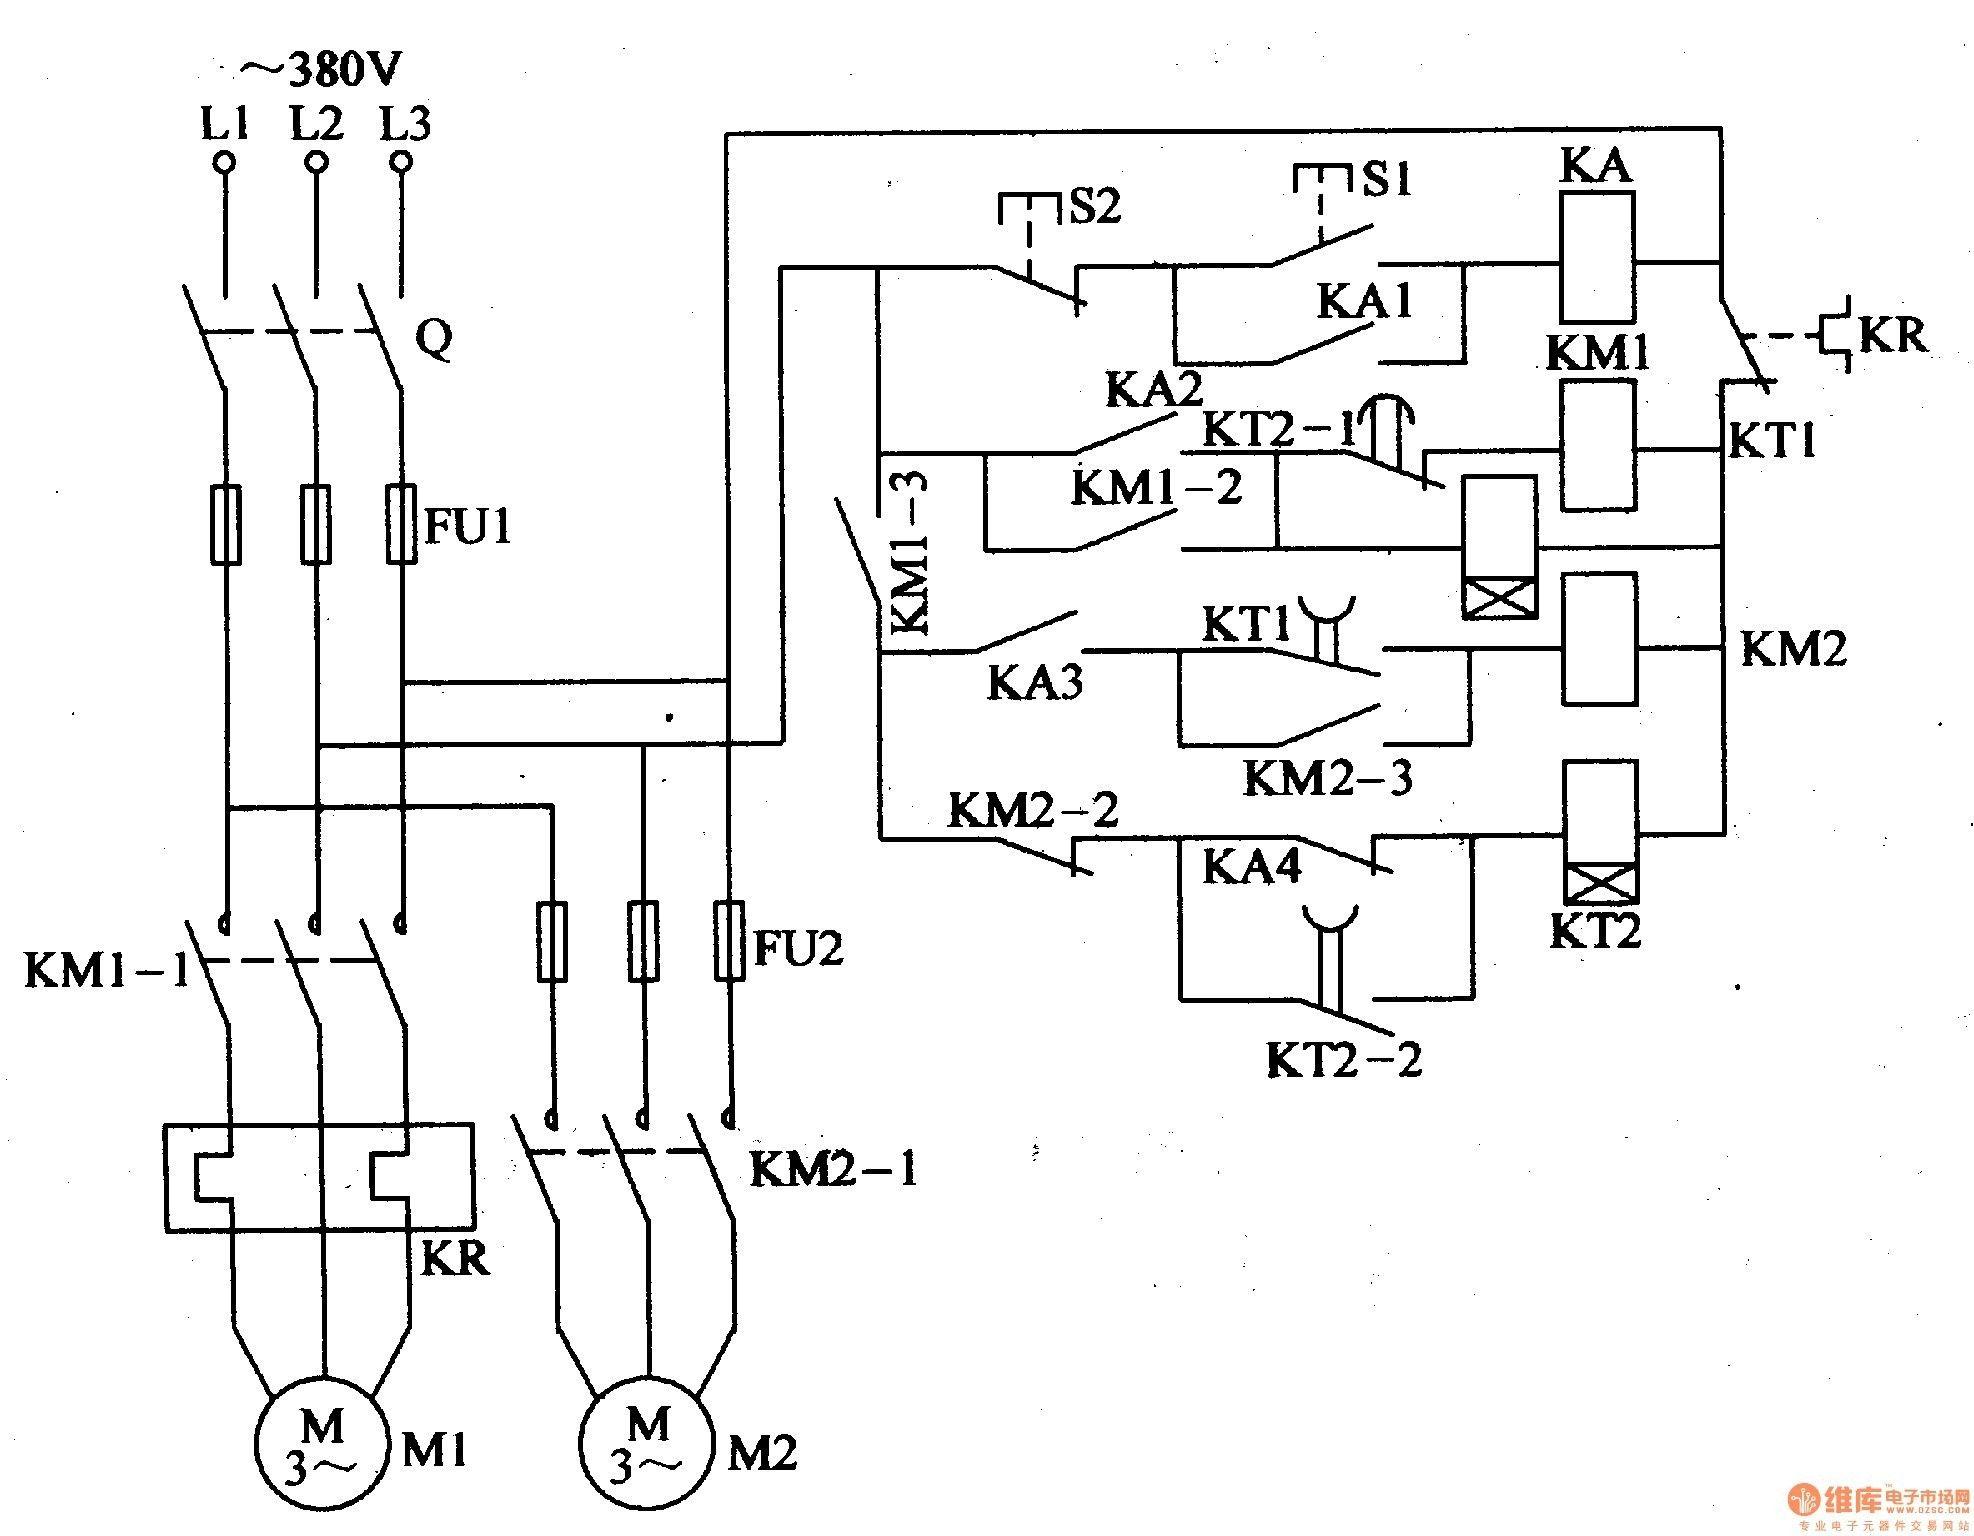 New Control Wiring Diagram Definition Diagram Diagramsample Diagramtemplate Wiringdiagram Diagra Electrical Panel Wiring Electrical Wiring Diagram Diagram